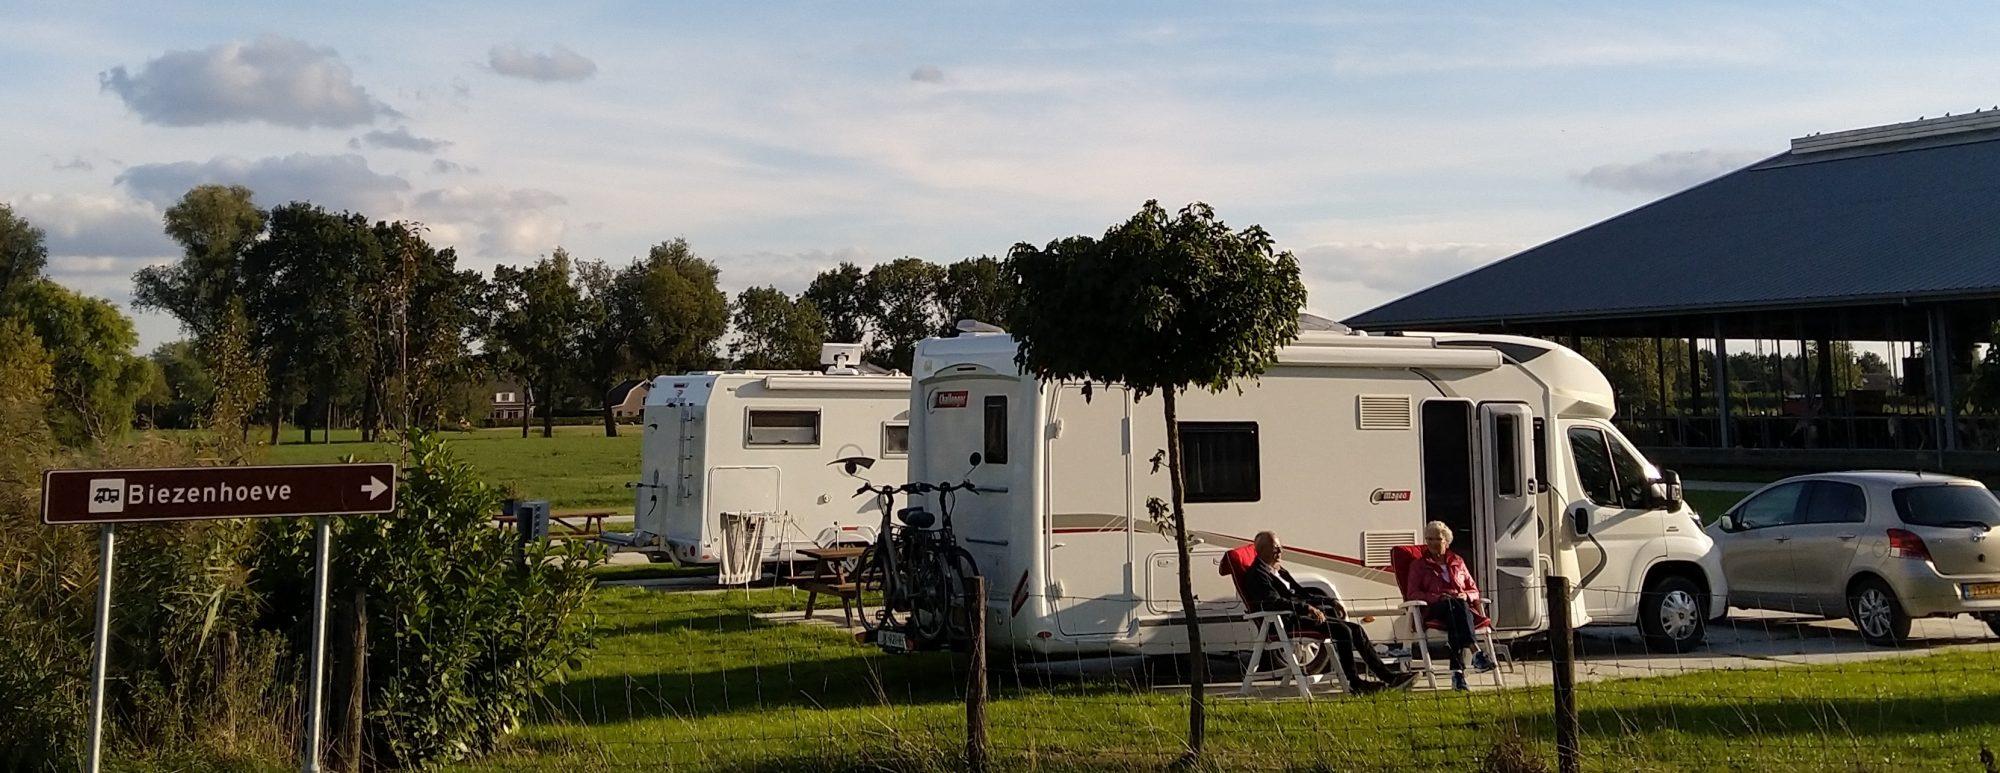 Campererf Biezenhoeve